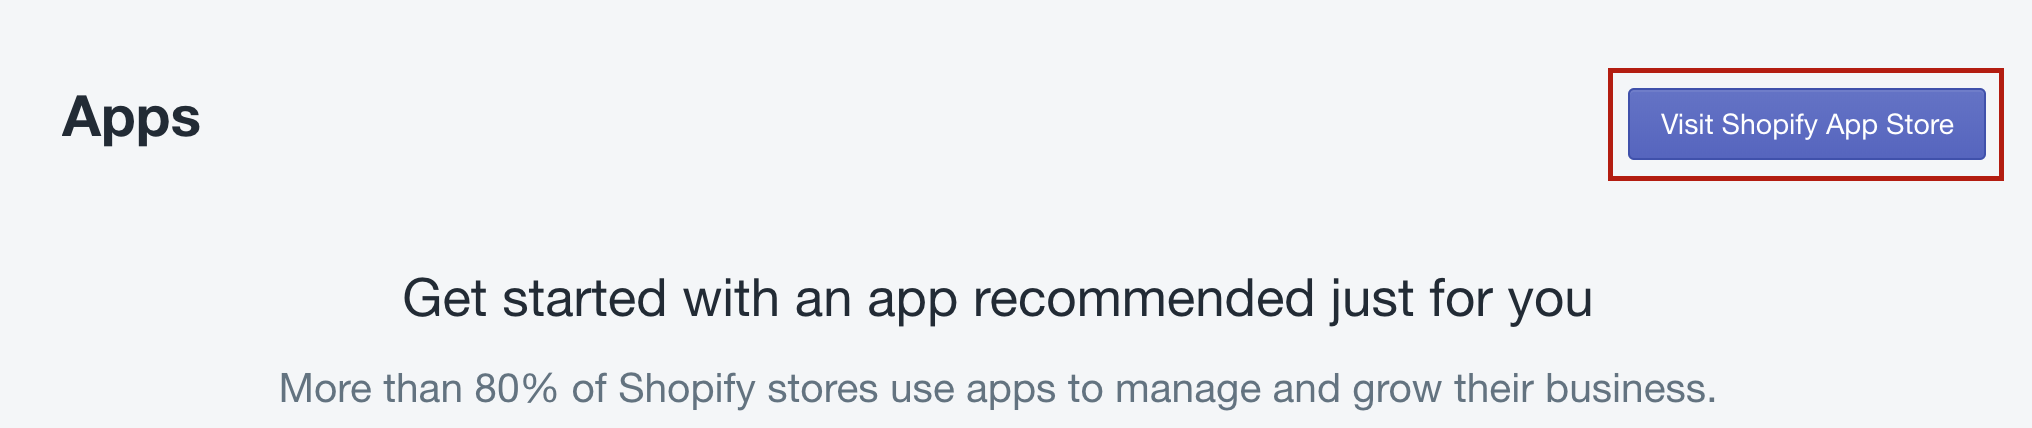 visit Shopify app store